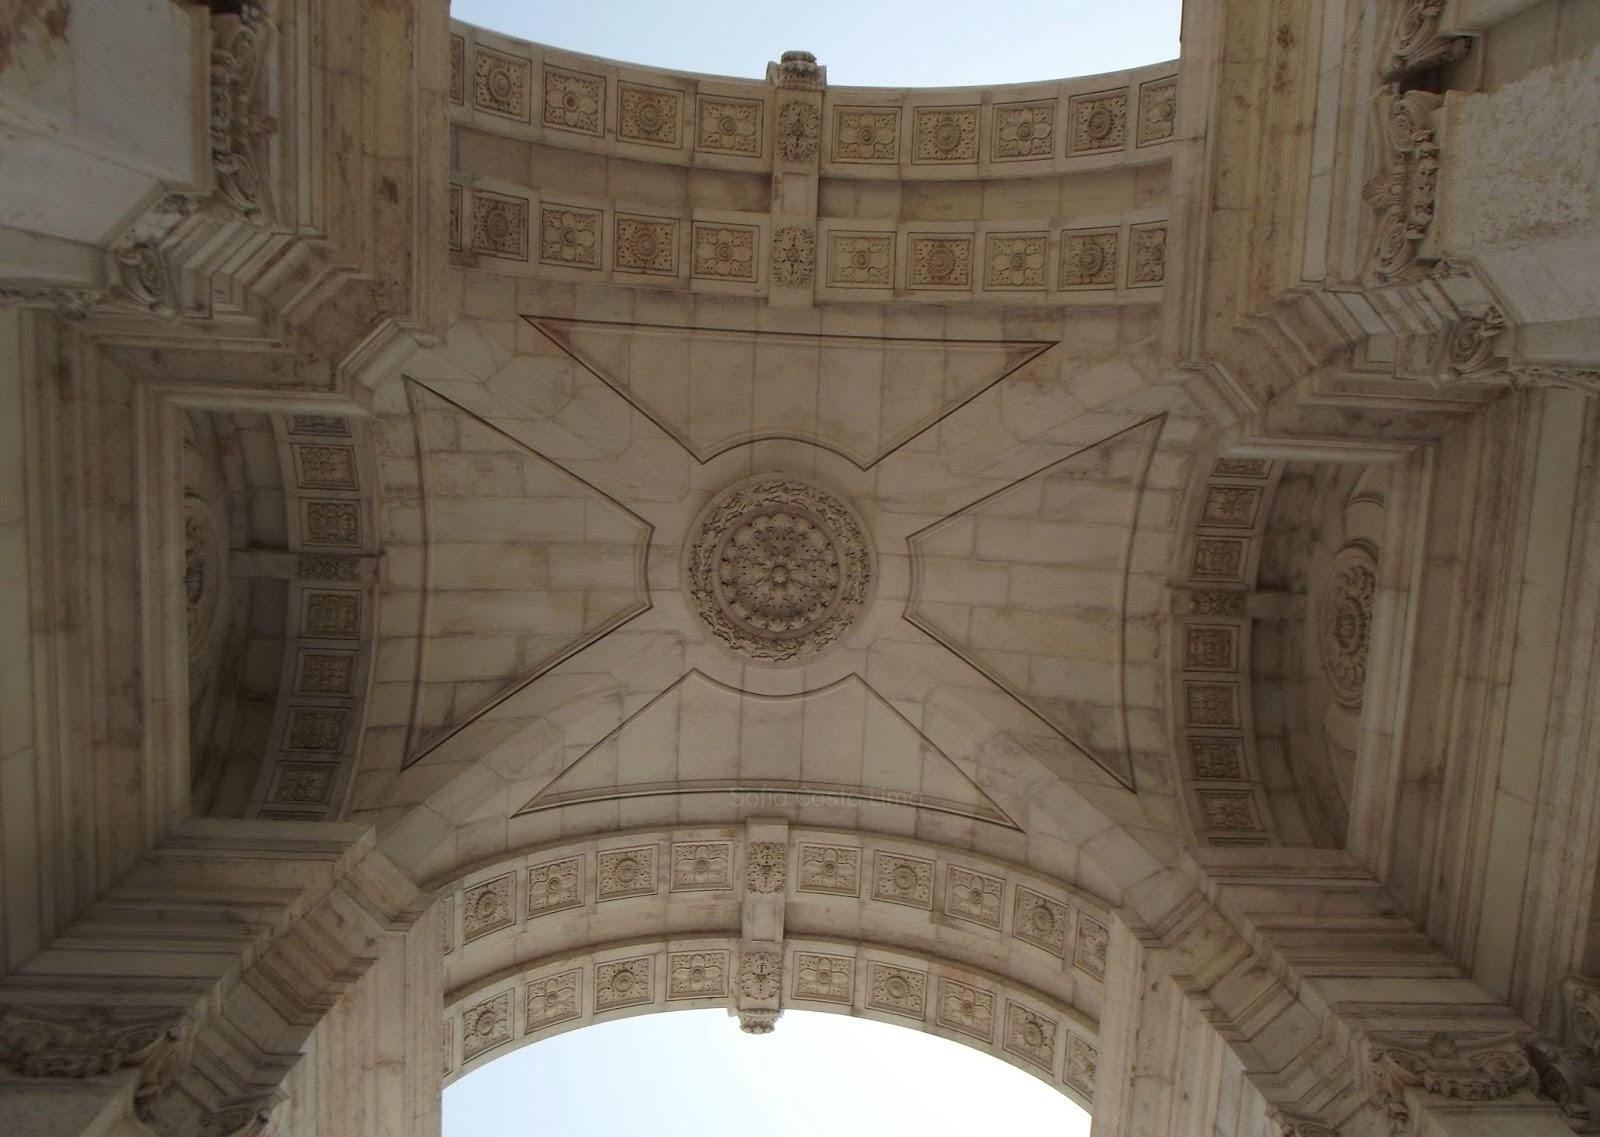 Lisboa: Terreiro do Paço